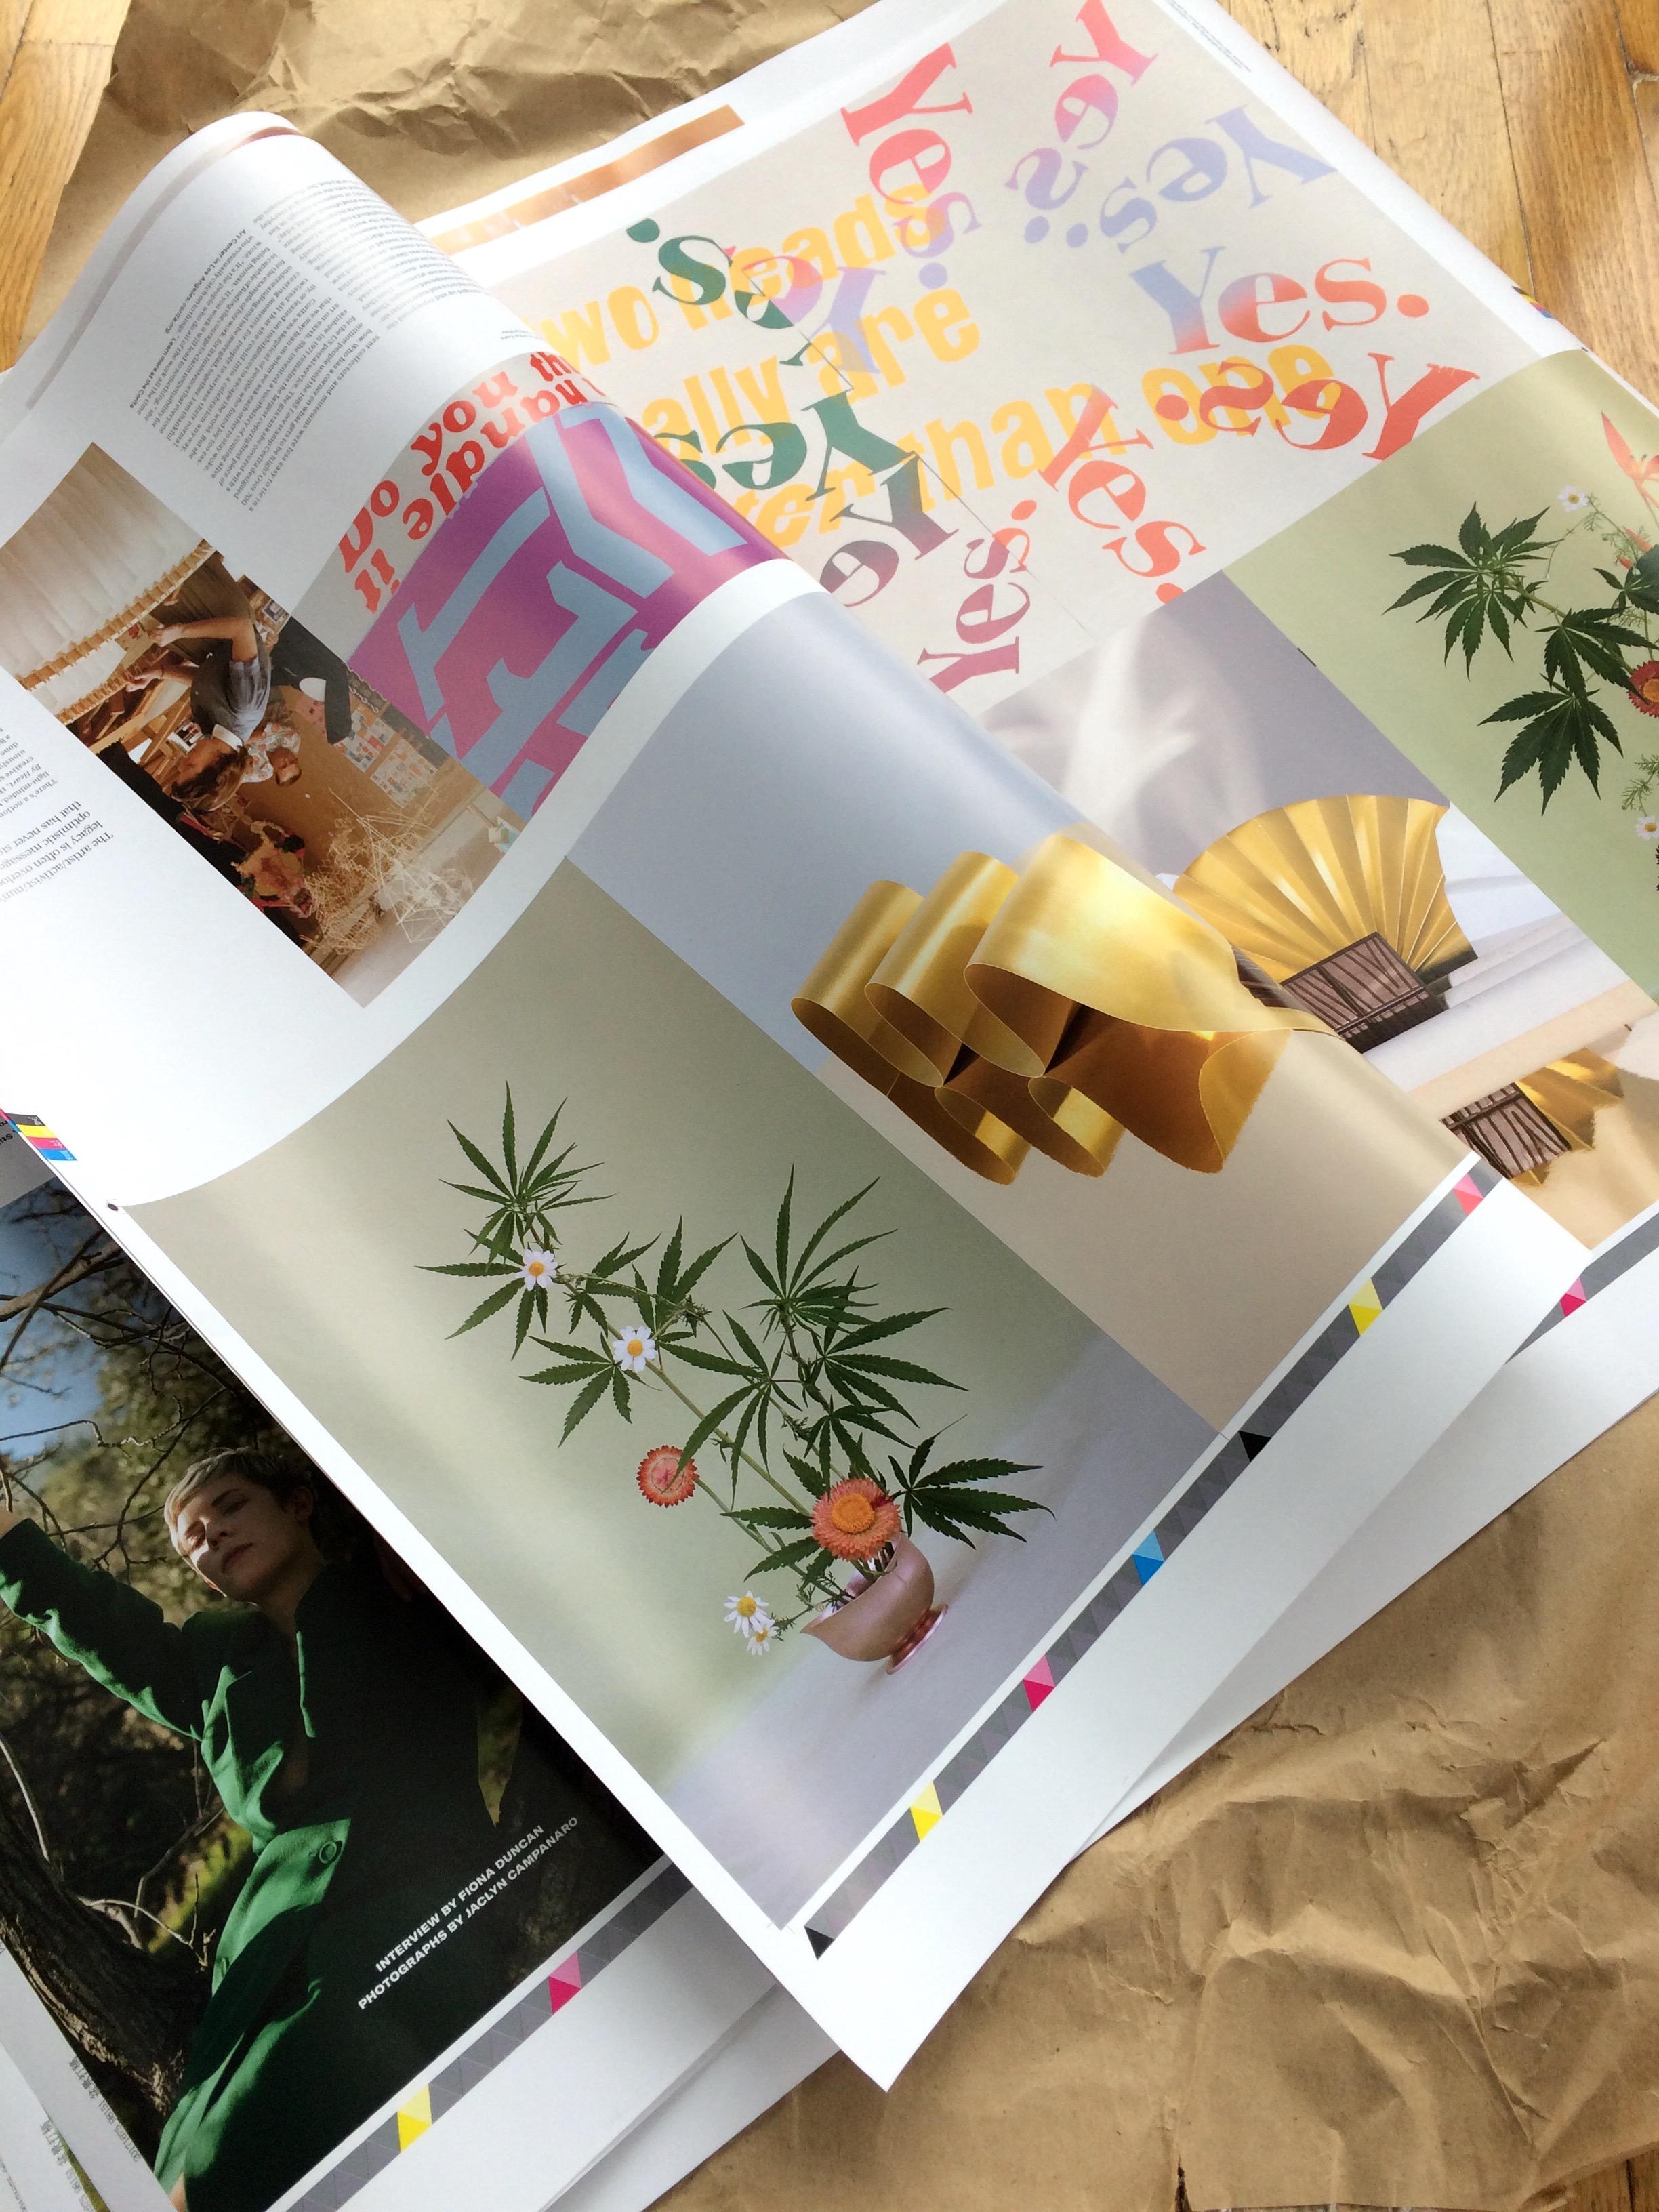 Broccoli magazine proofs